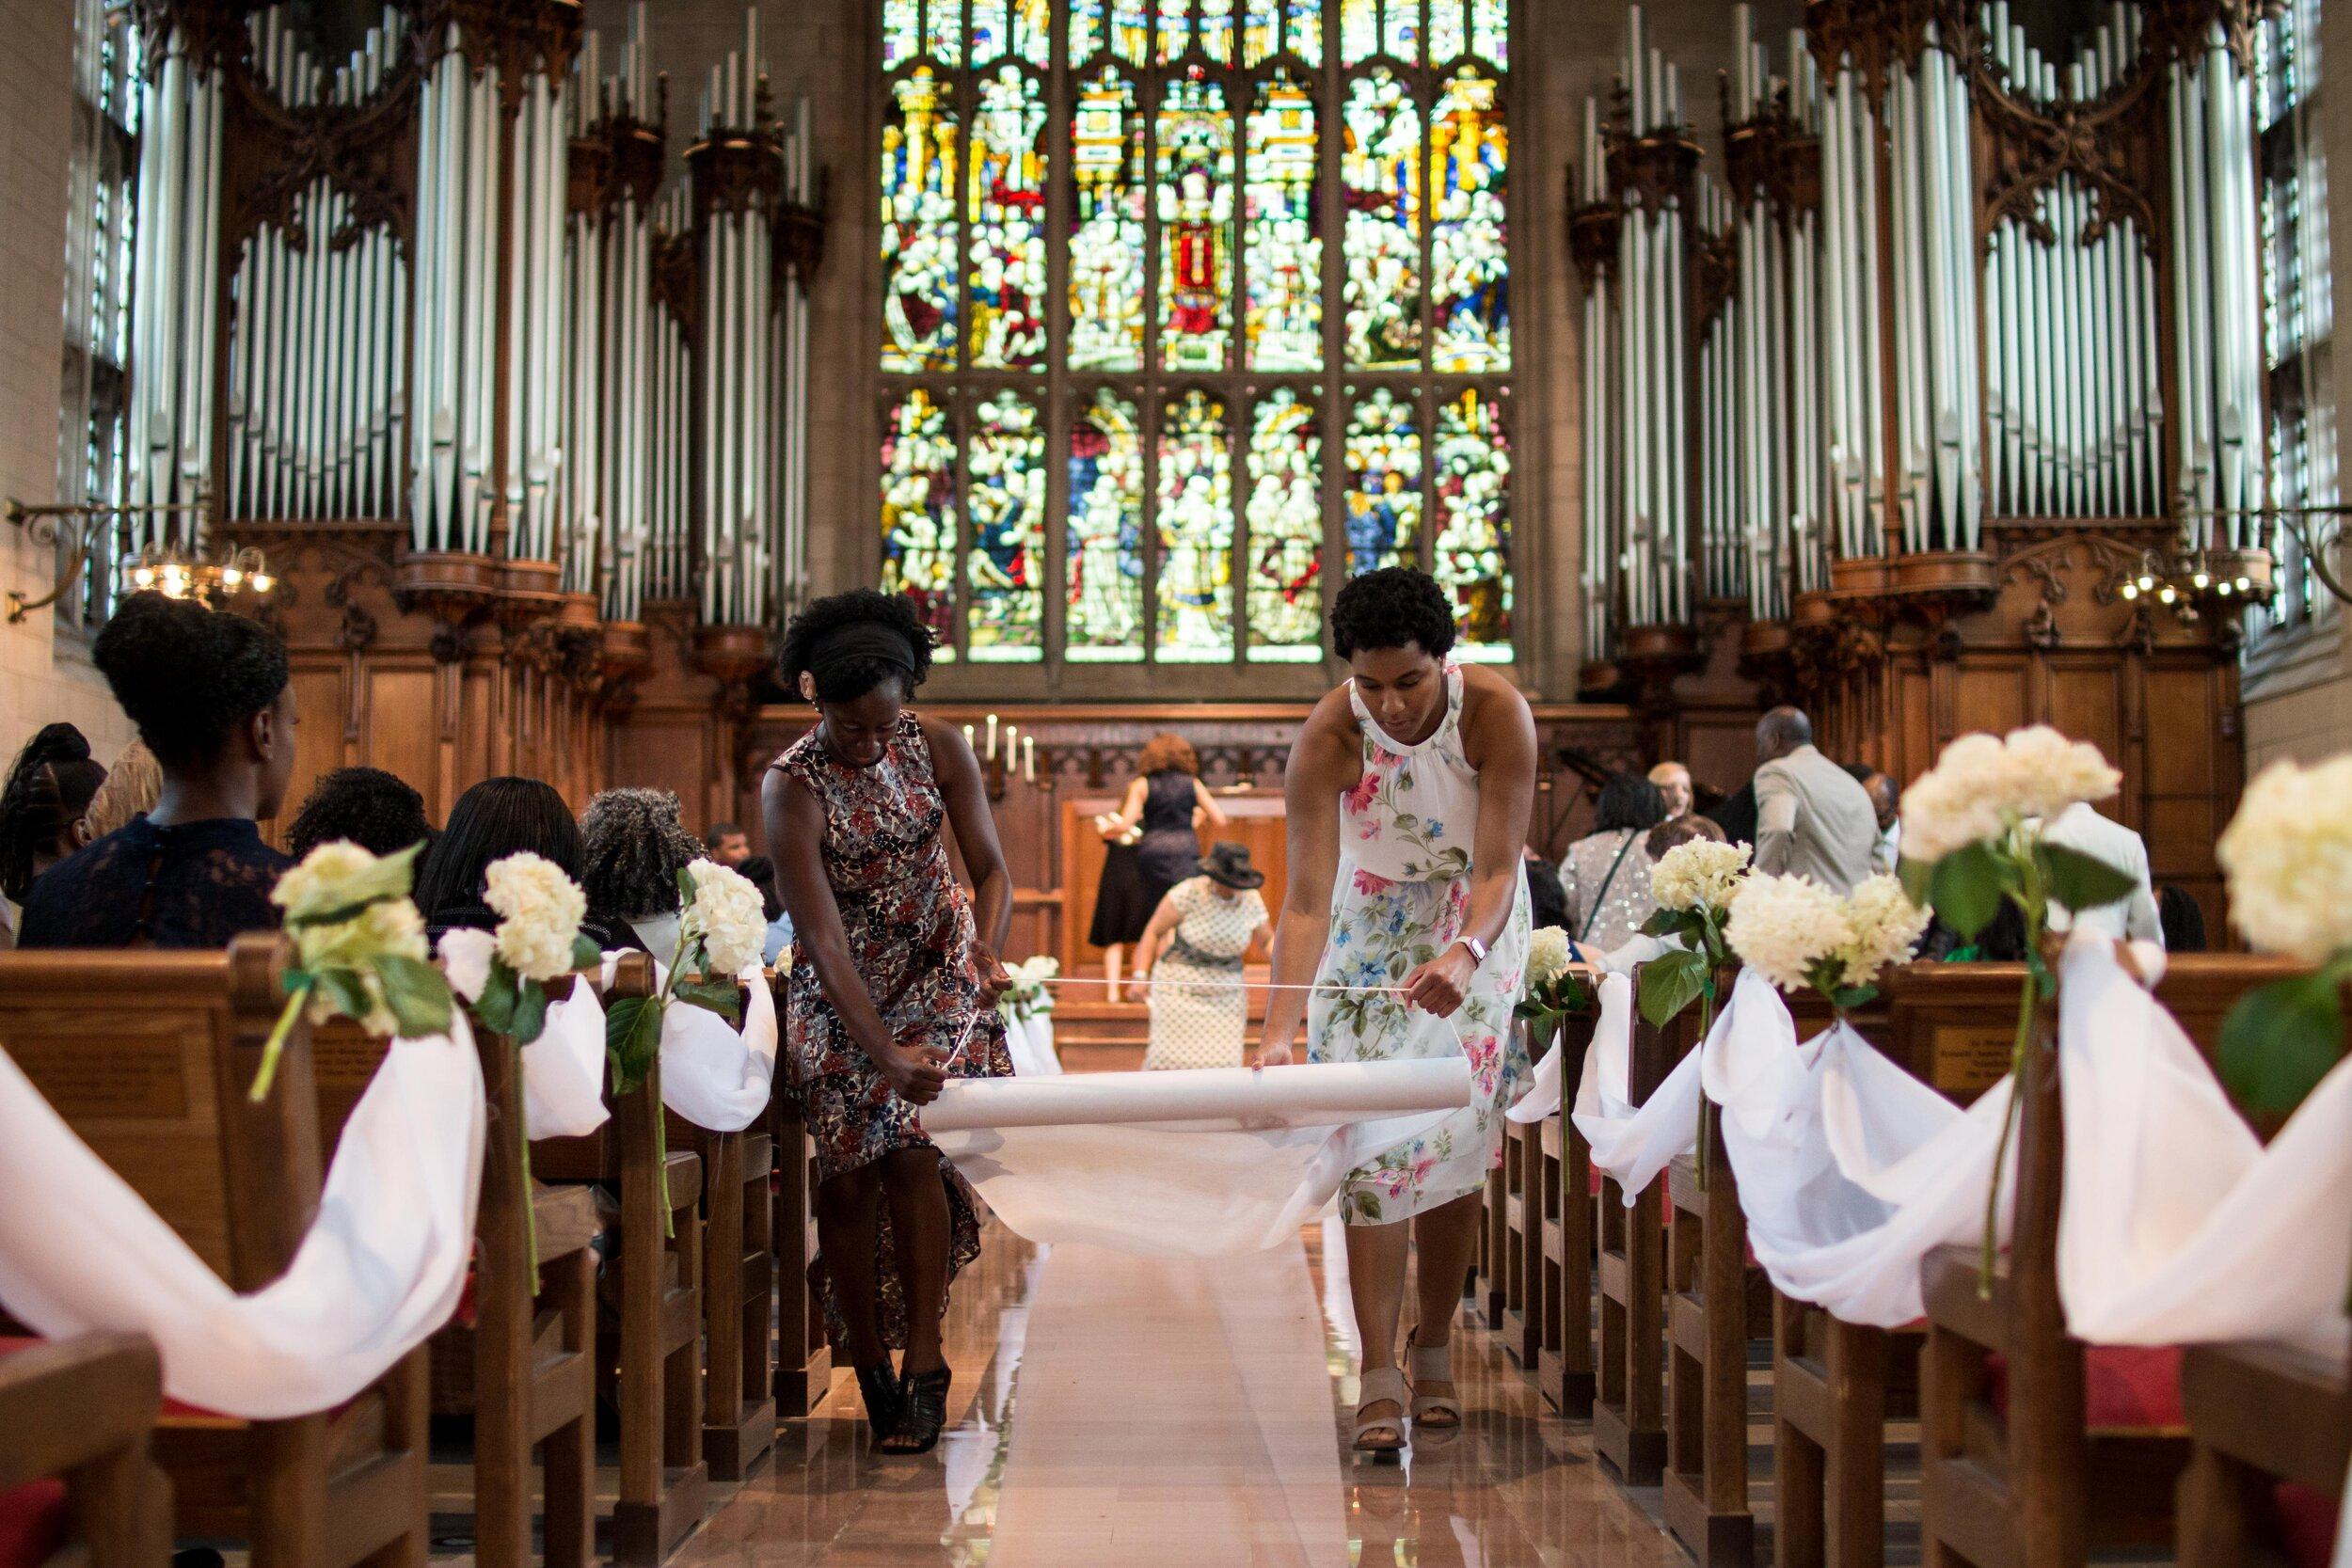 8_3_2019_BONTY_WEDDING-227.jpg